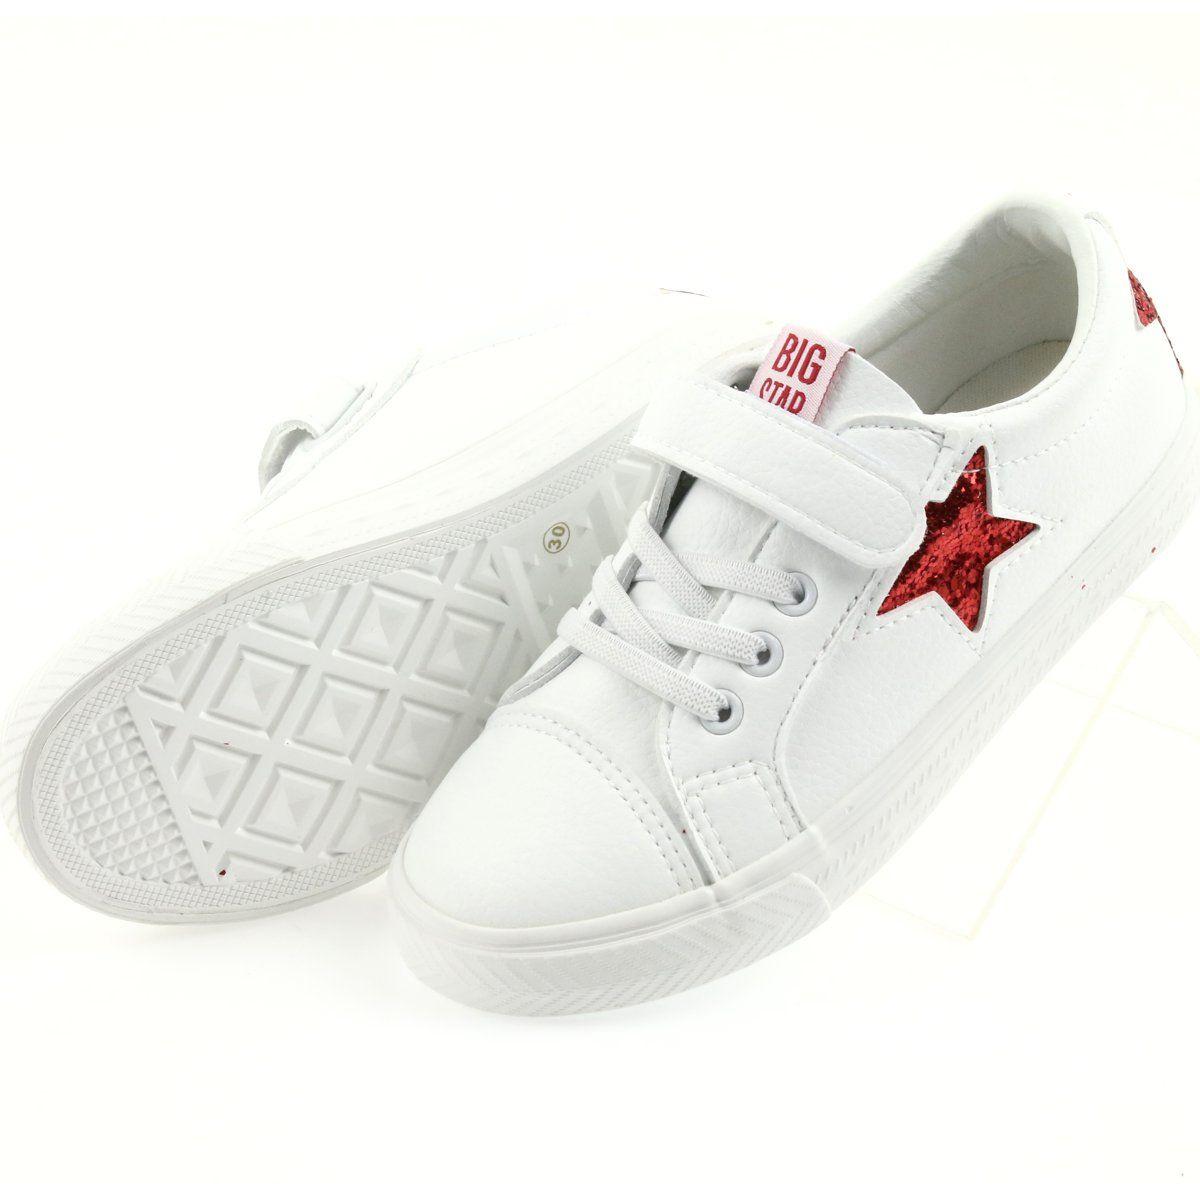 Big Star Trampki Na Rzepy Gwiazda 374102 Biale Czerwone Sneakers Converse Sneaker Shoes